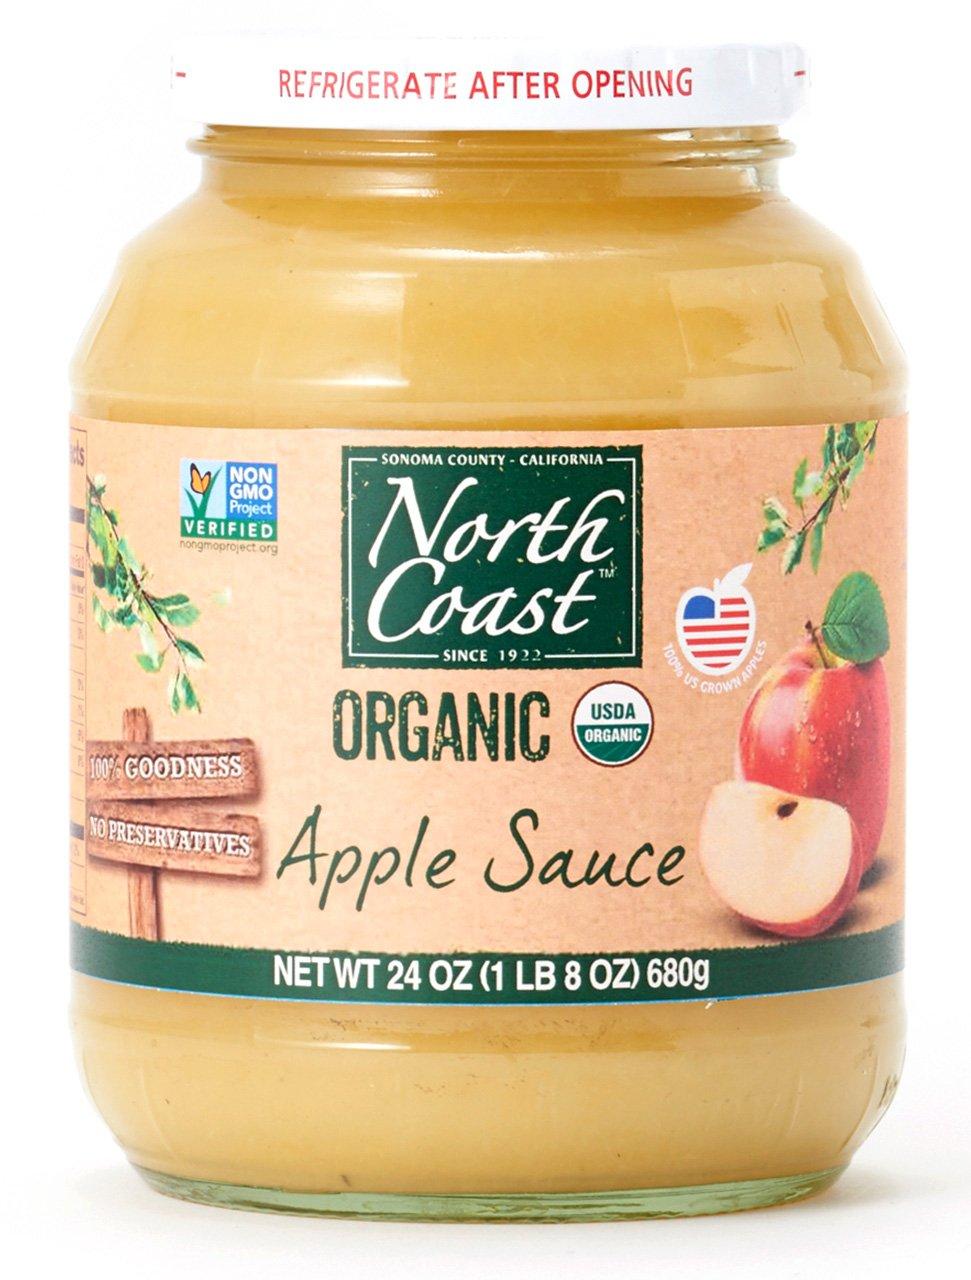 North Coast Apple Sauce Jar Organic, 24 oz (frozen) by North Coast